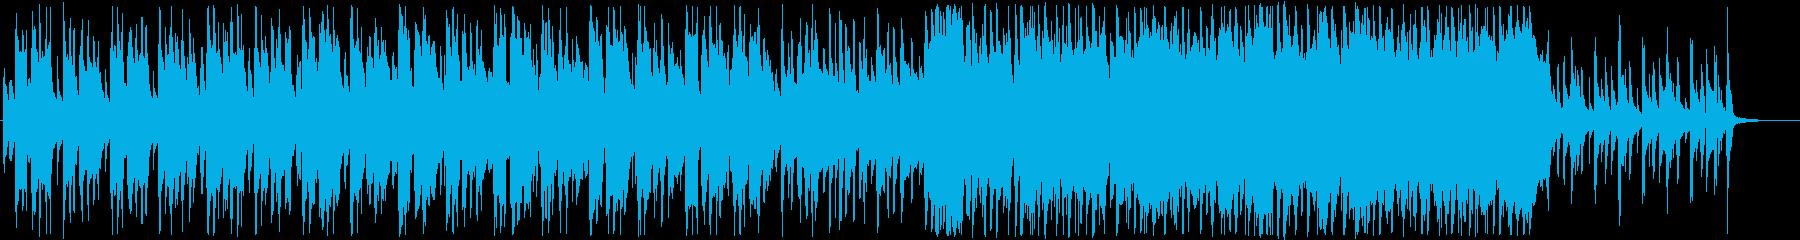 Greenbirdの再生済みの波形